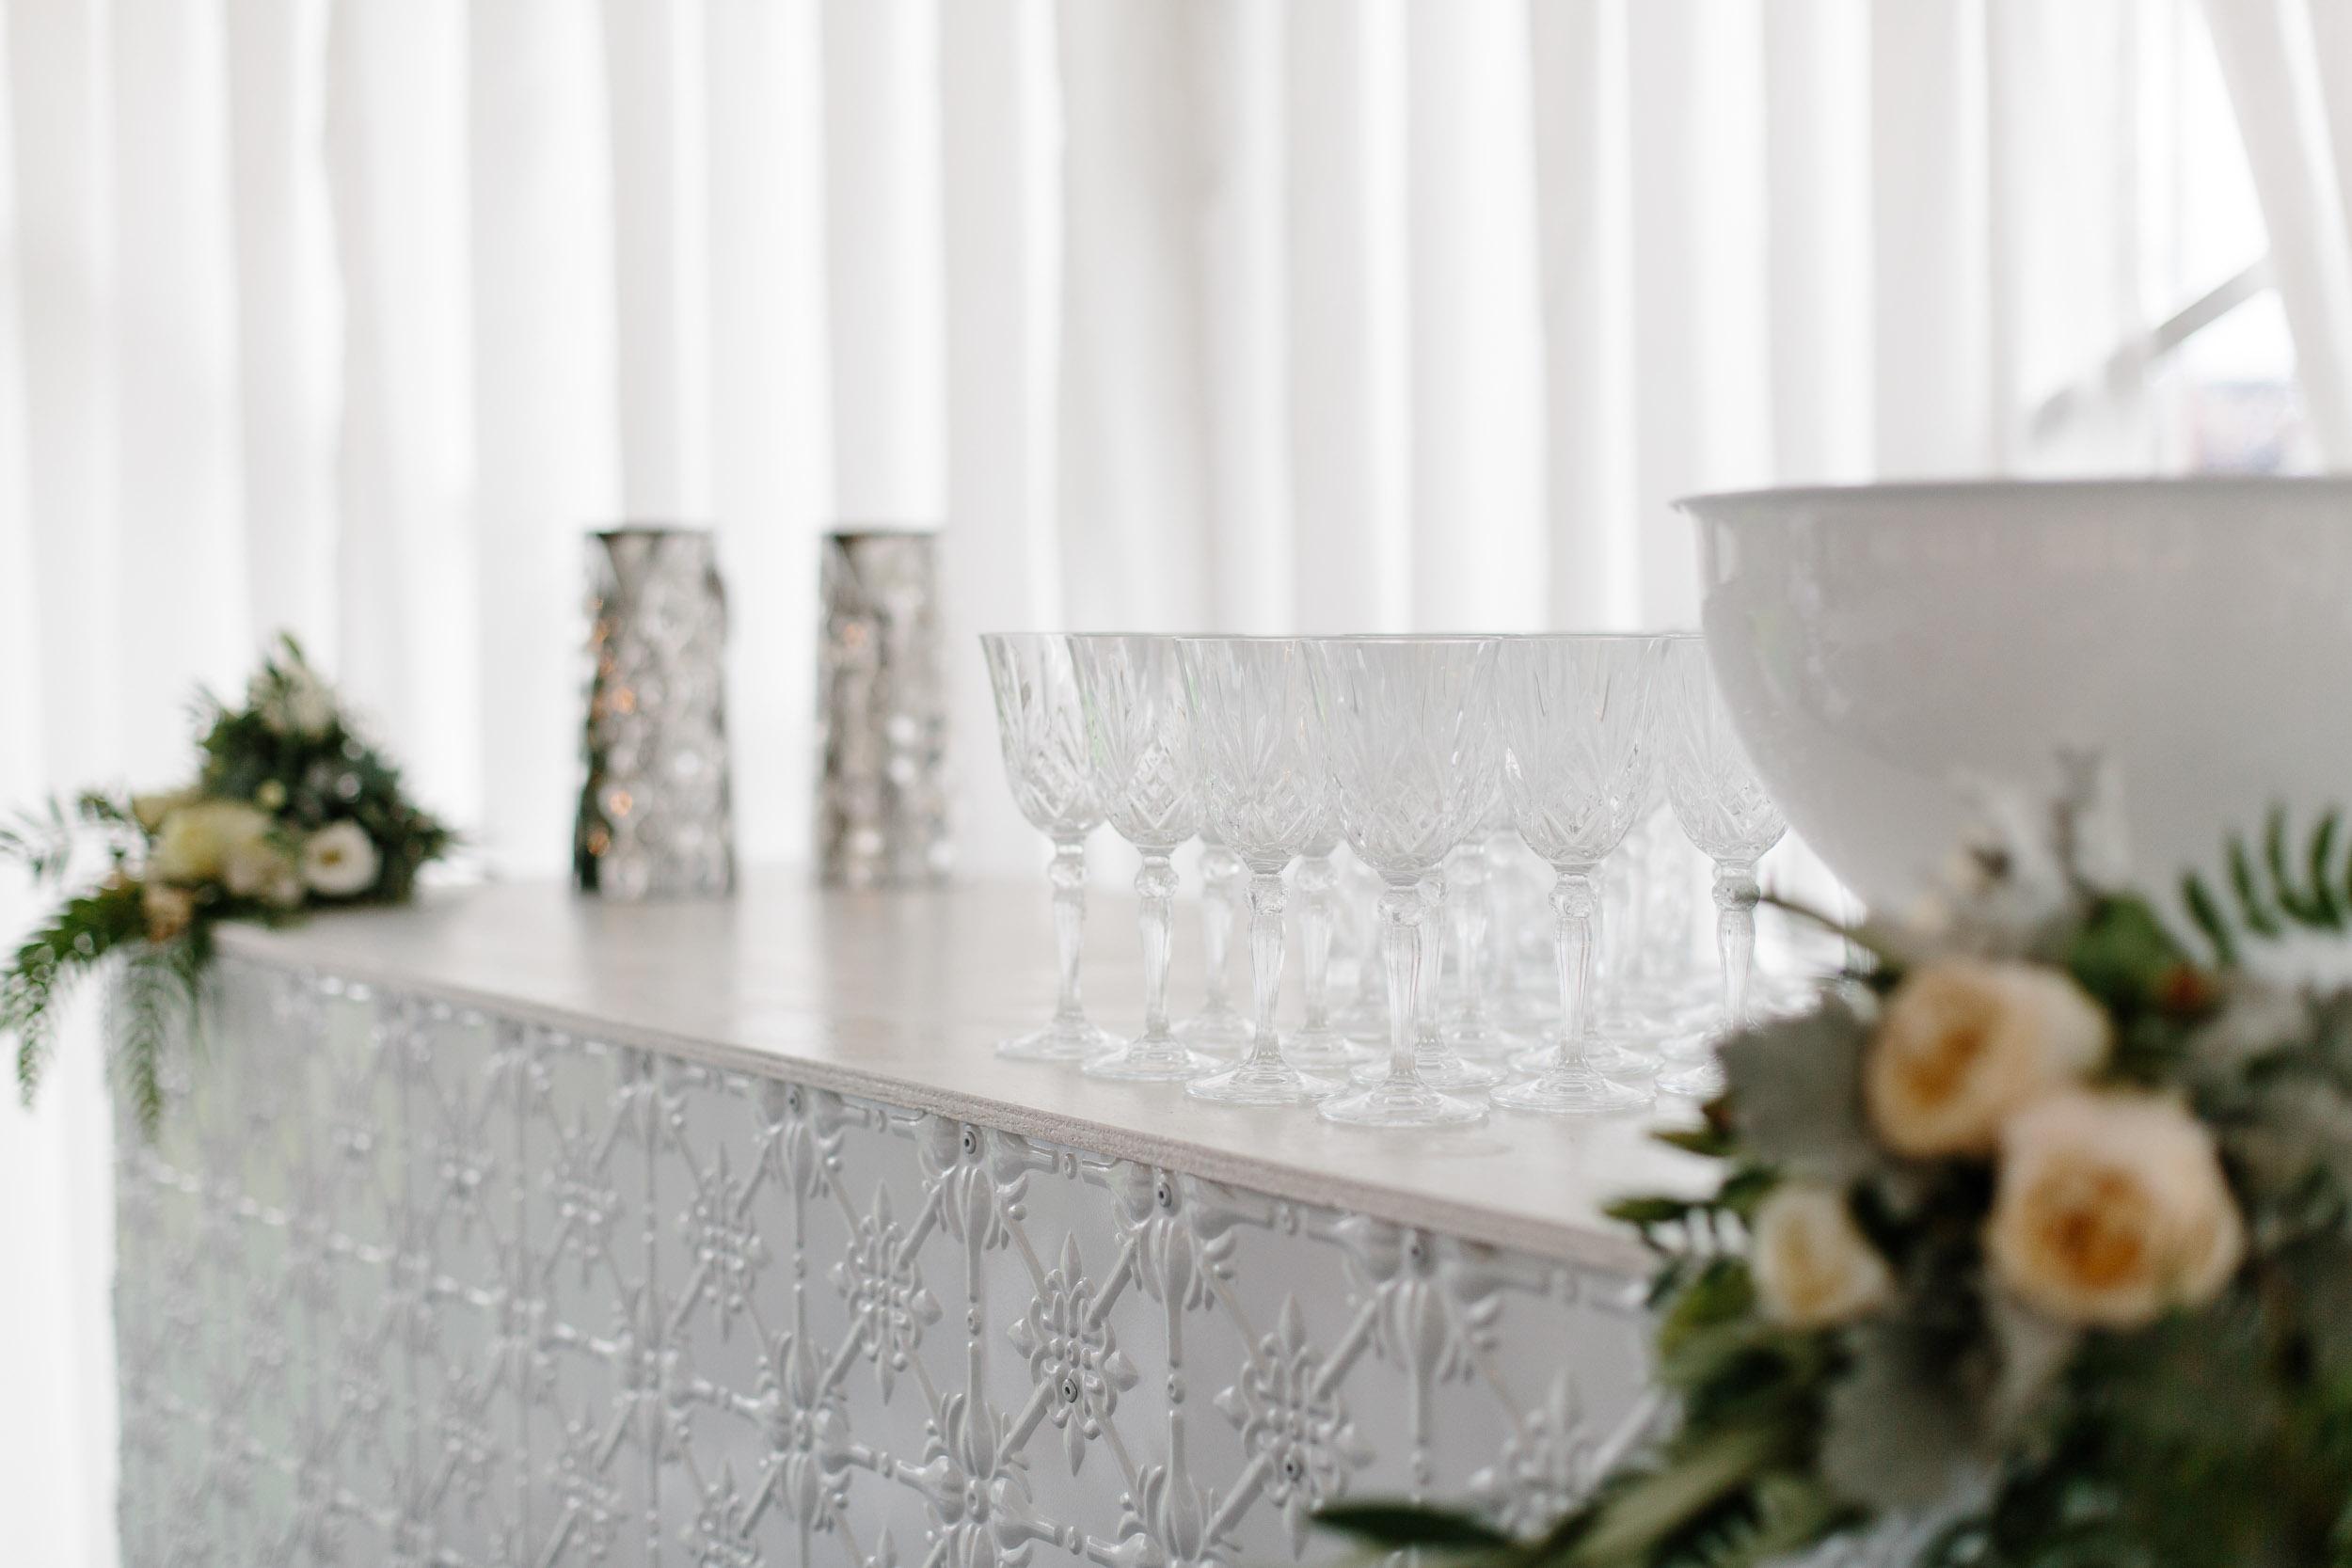 Kas-Richards-Mornington-Peninsula-Private-Property-Wedding-Marianna-Hardwick-Gown-546.jpg